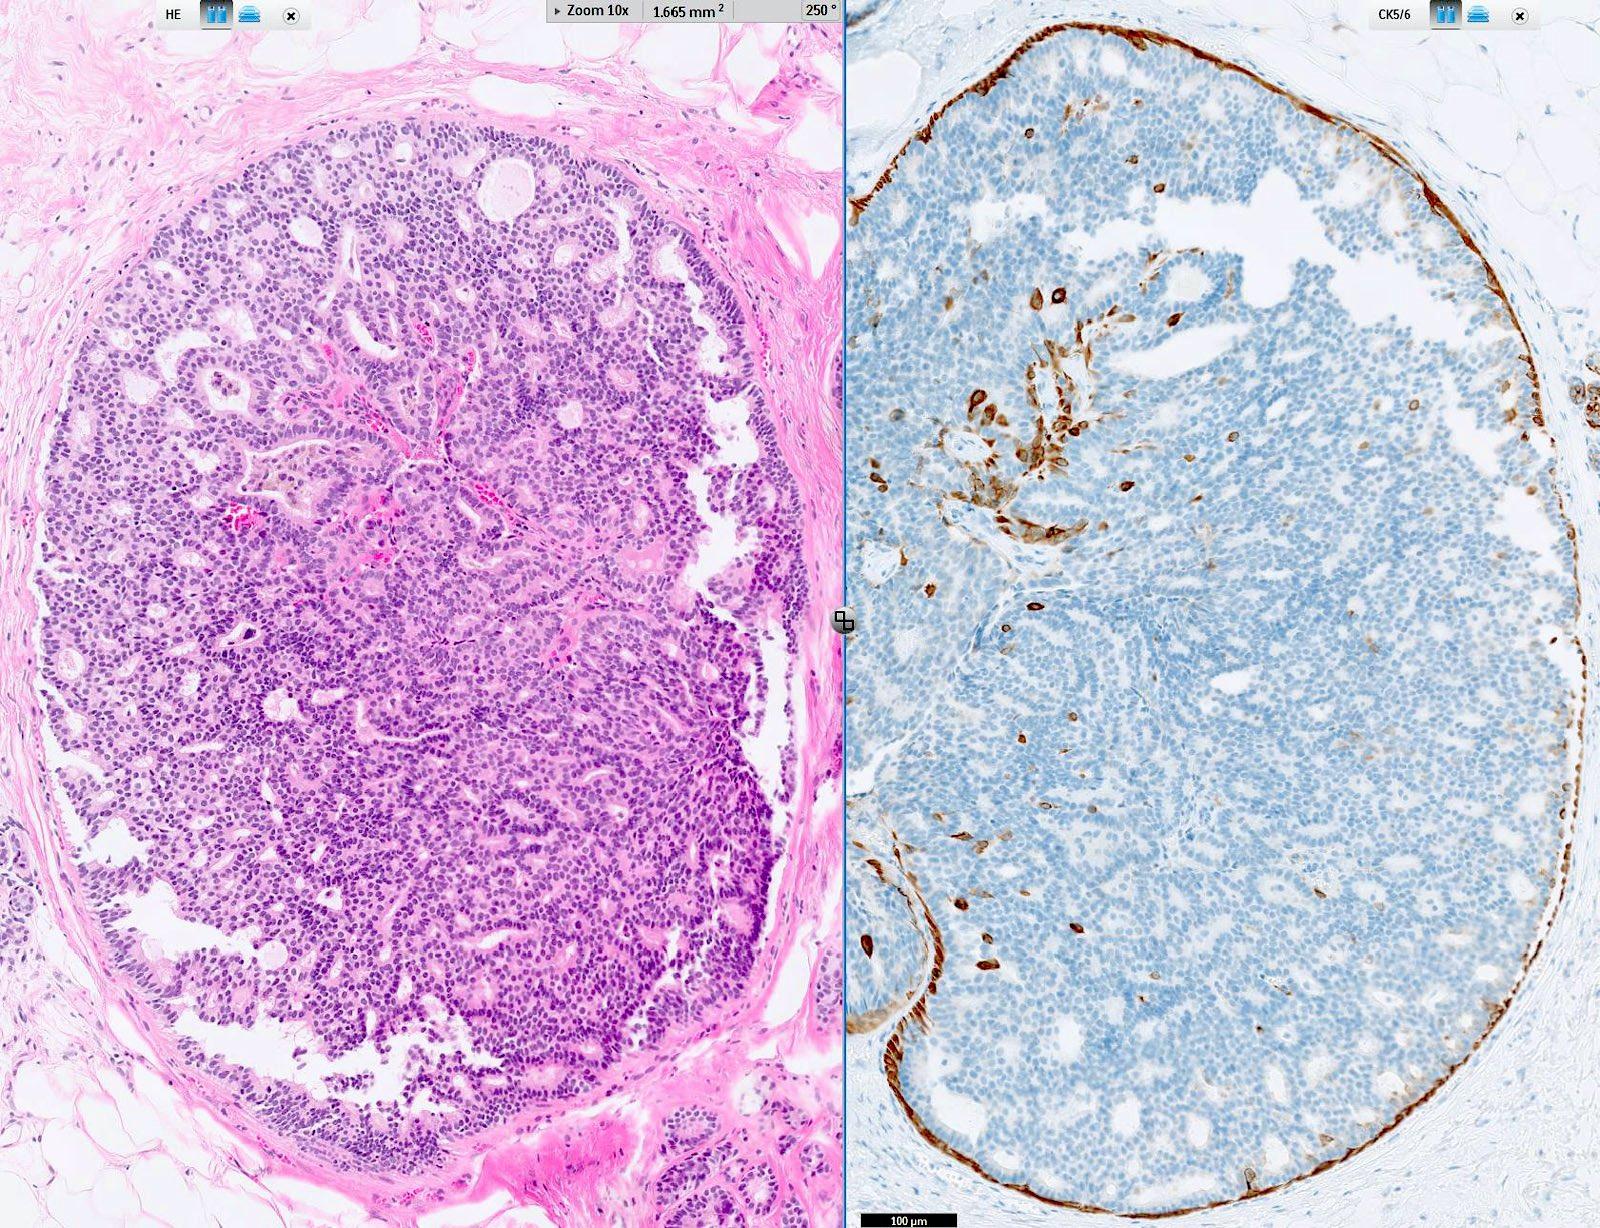 papilloma urotheliális patológia körvonalai)